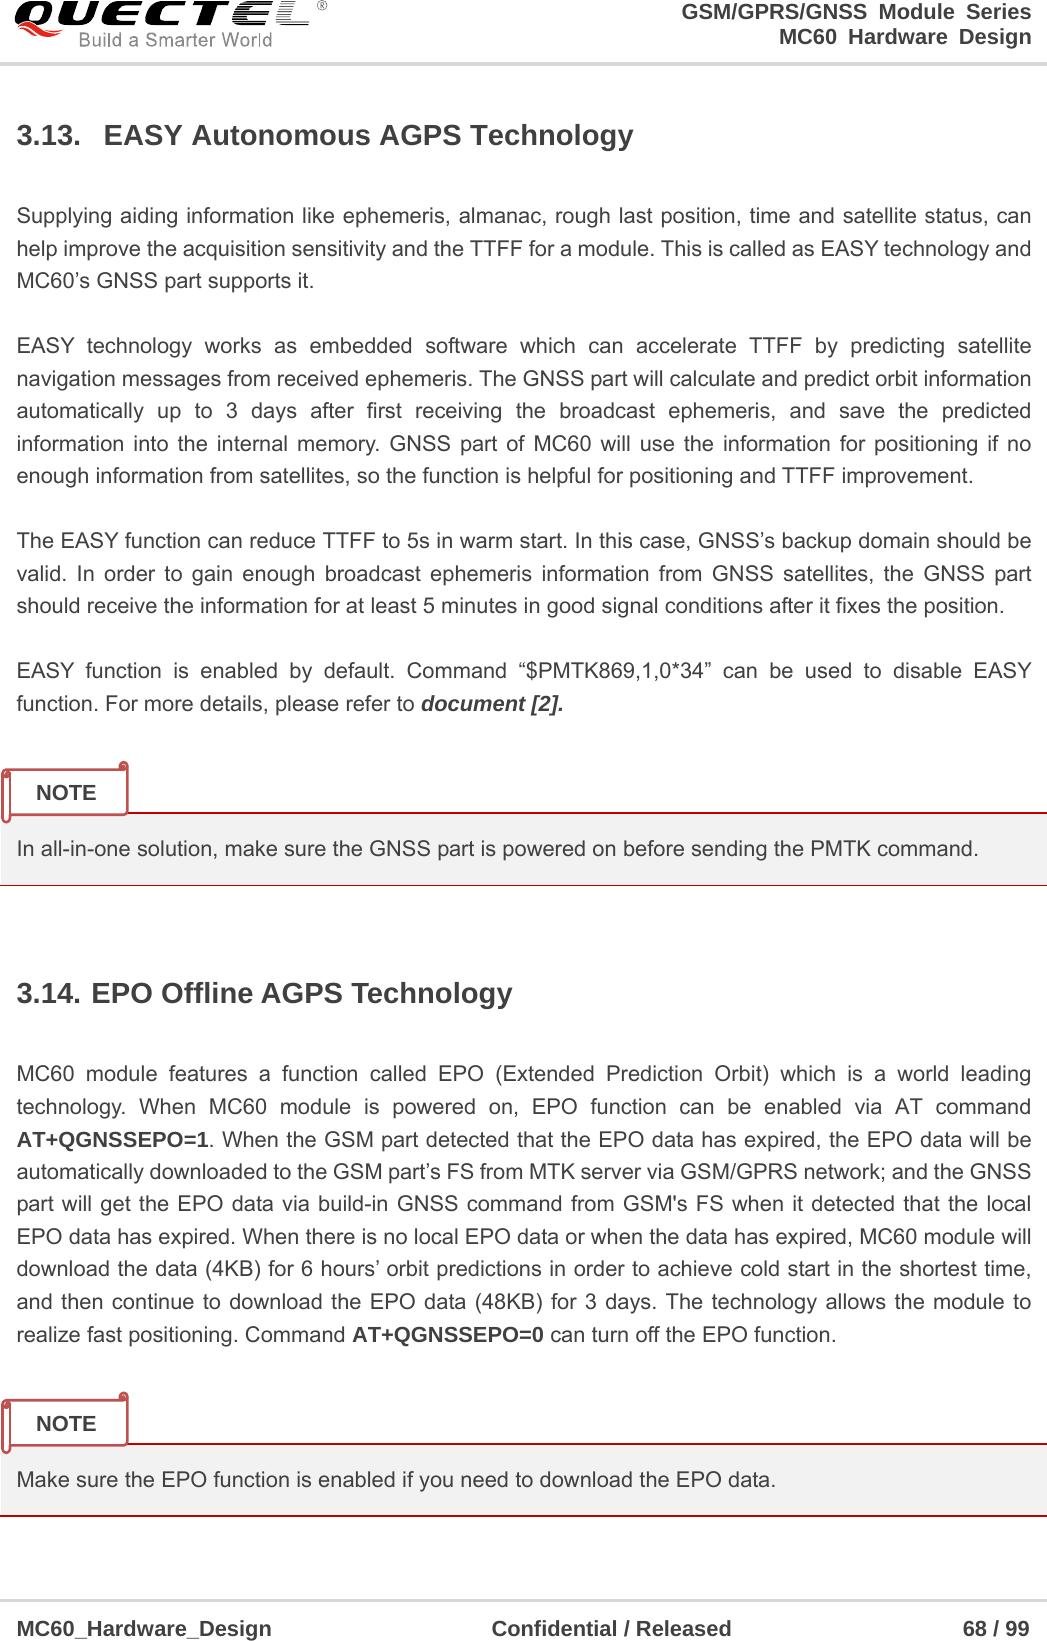 Quectel Wireless Solutions 201609MC60 GSM/GPRS/GNSS Module User Manual